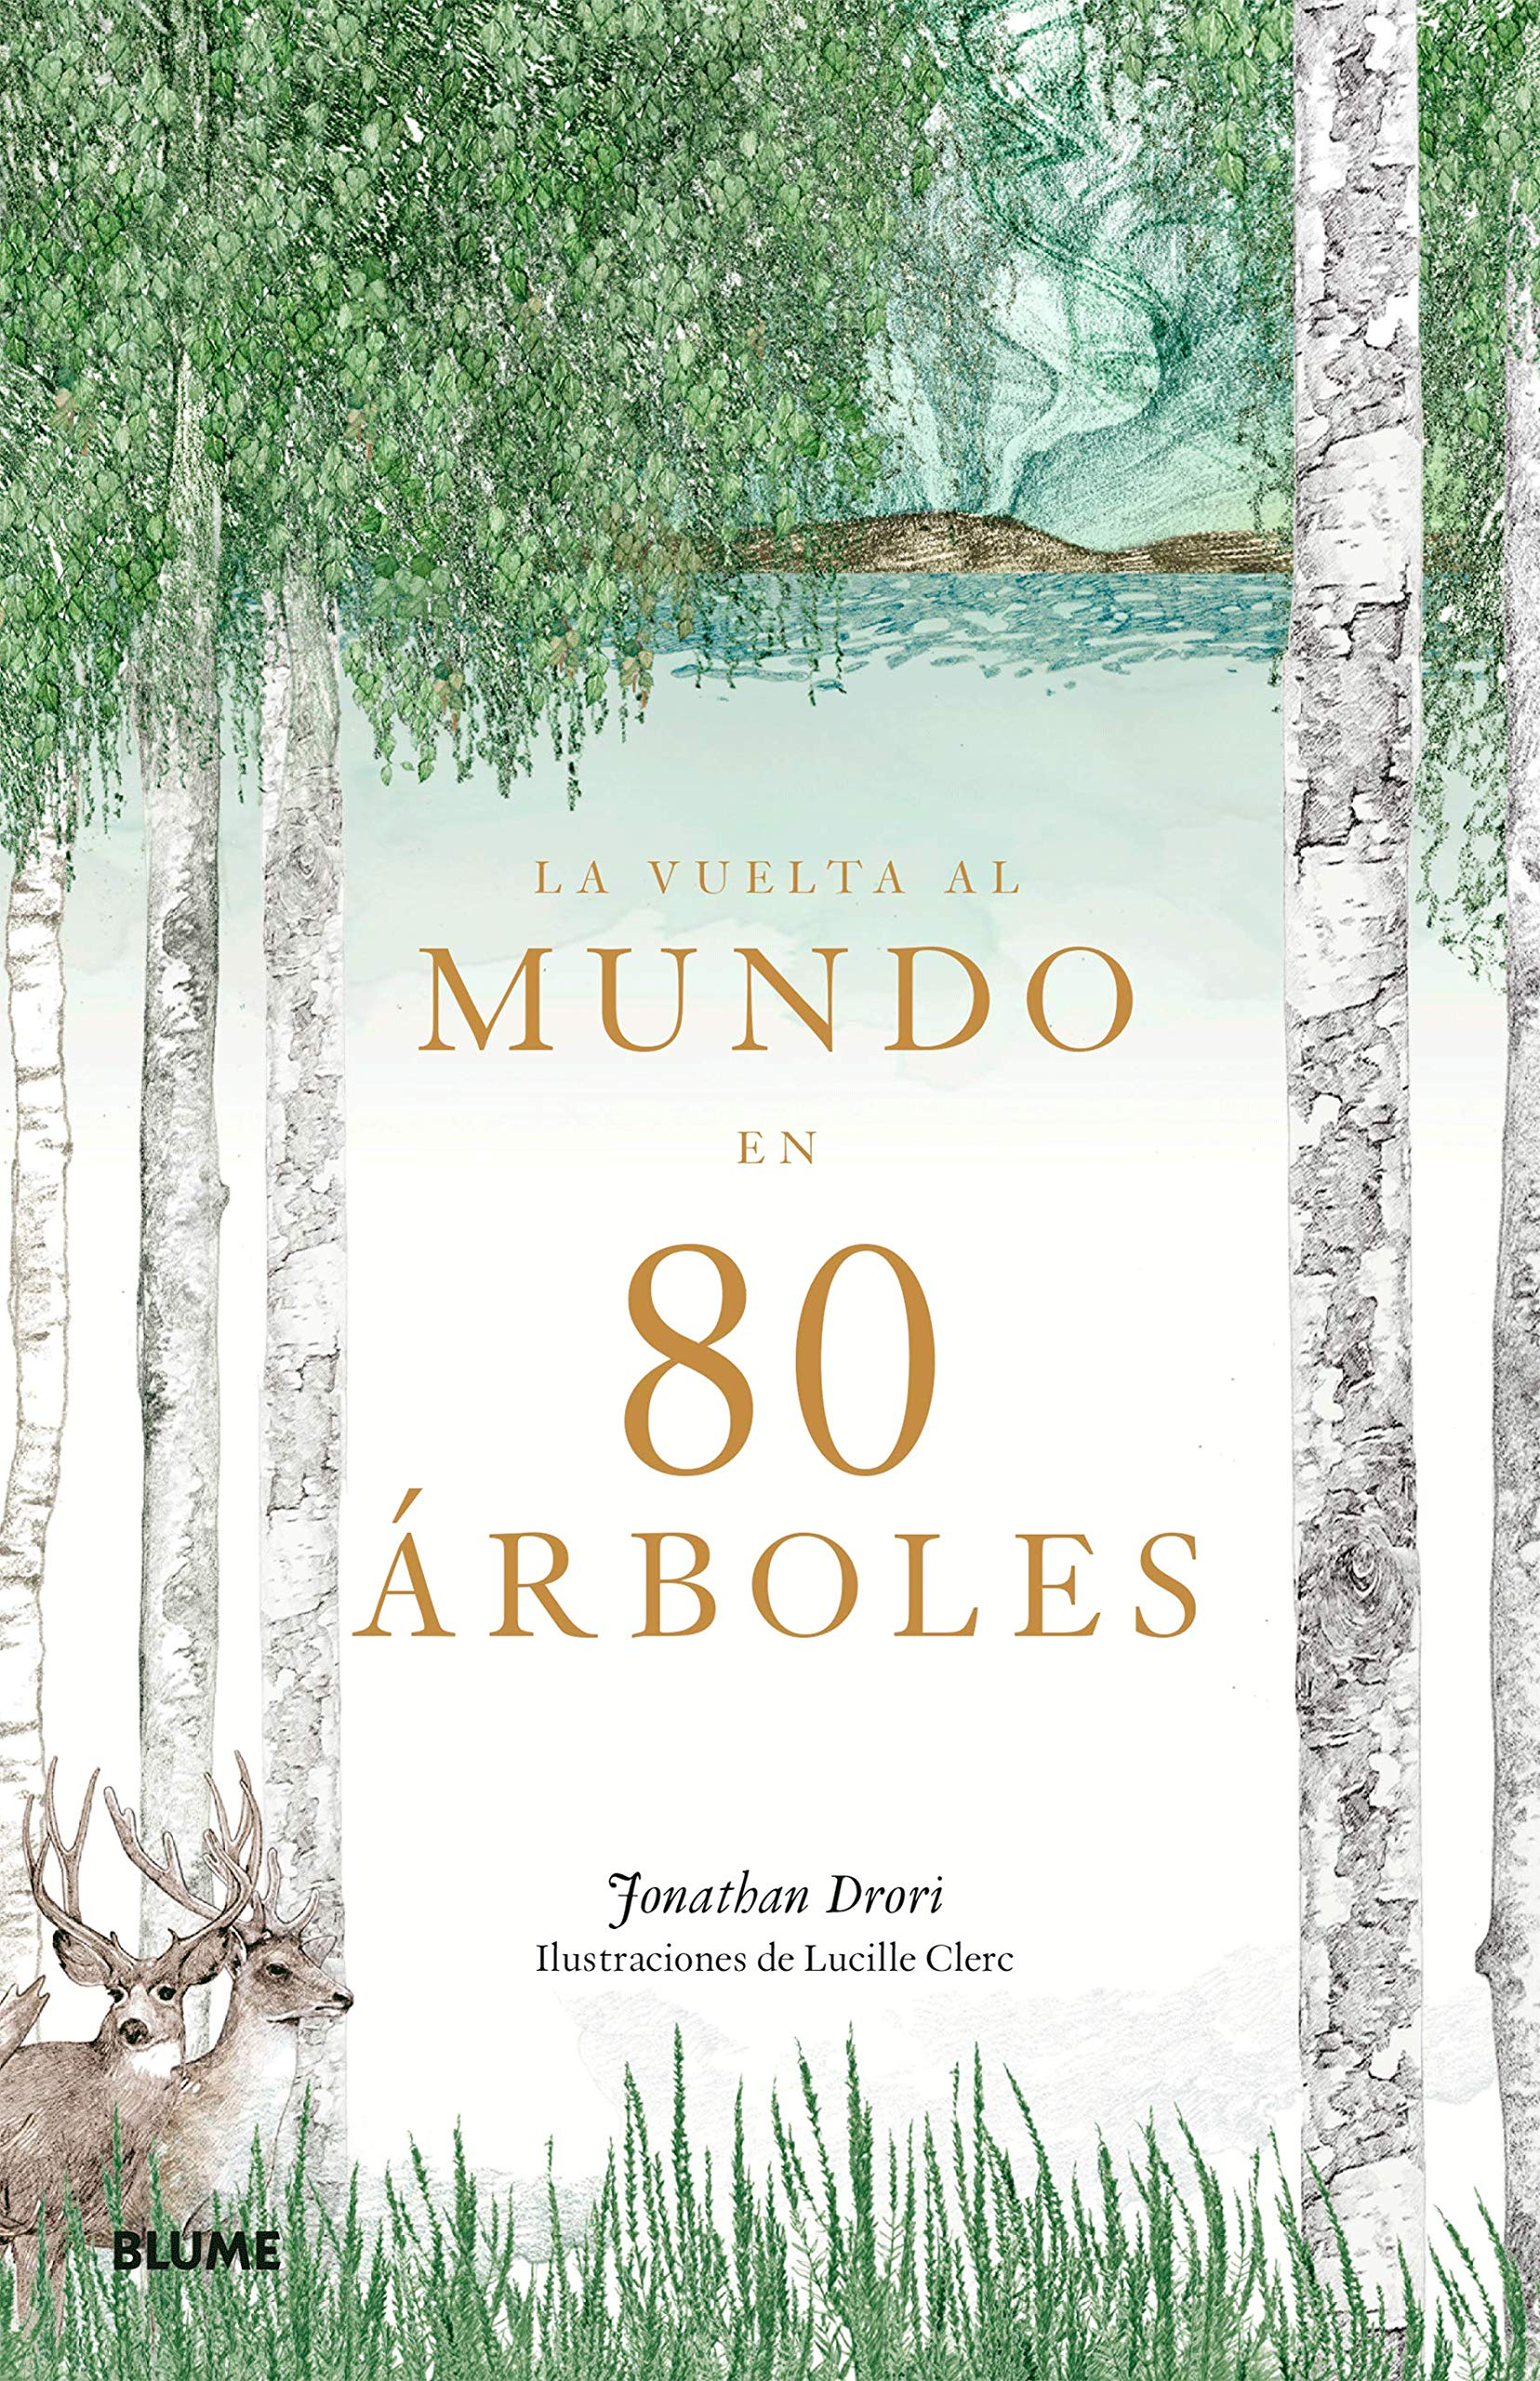 La vuelta al mundo en 80 árboles: Amazon.es: Drori, Jonathan ...